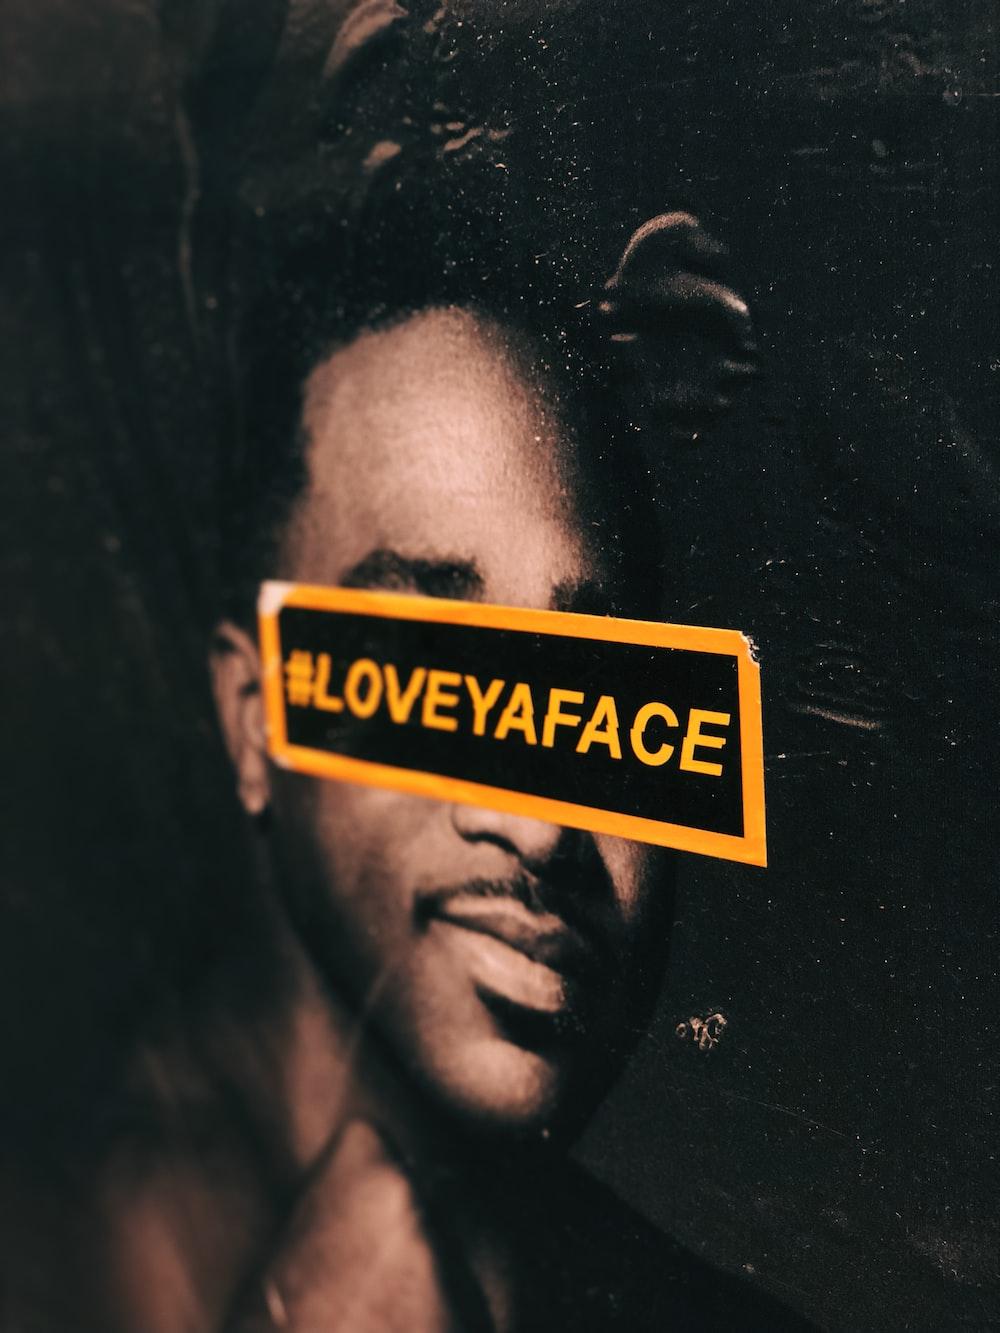 Loveyaface poster